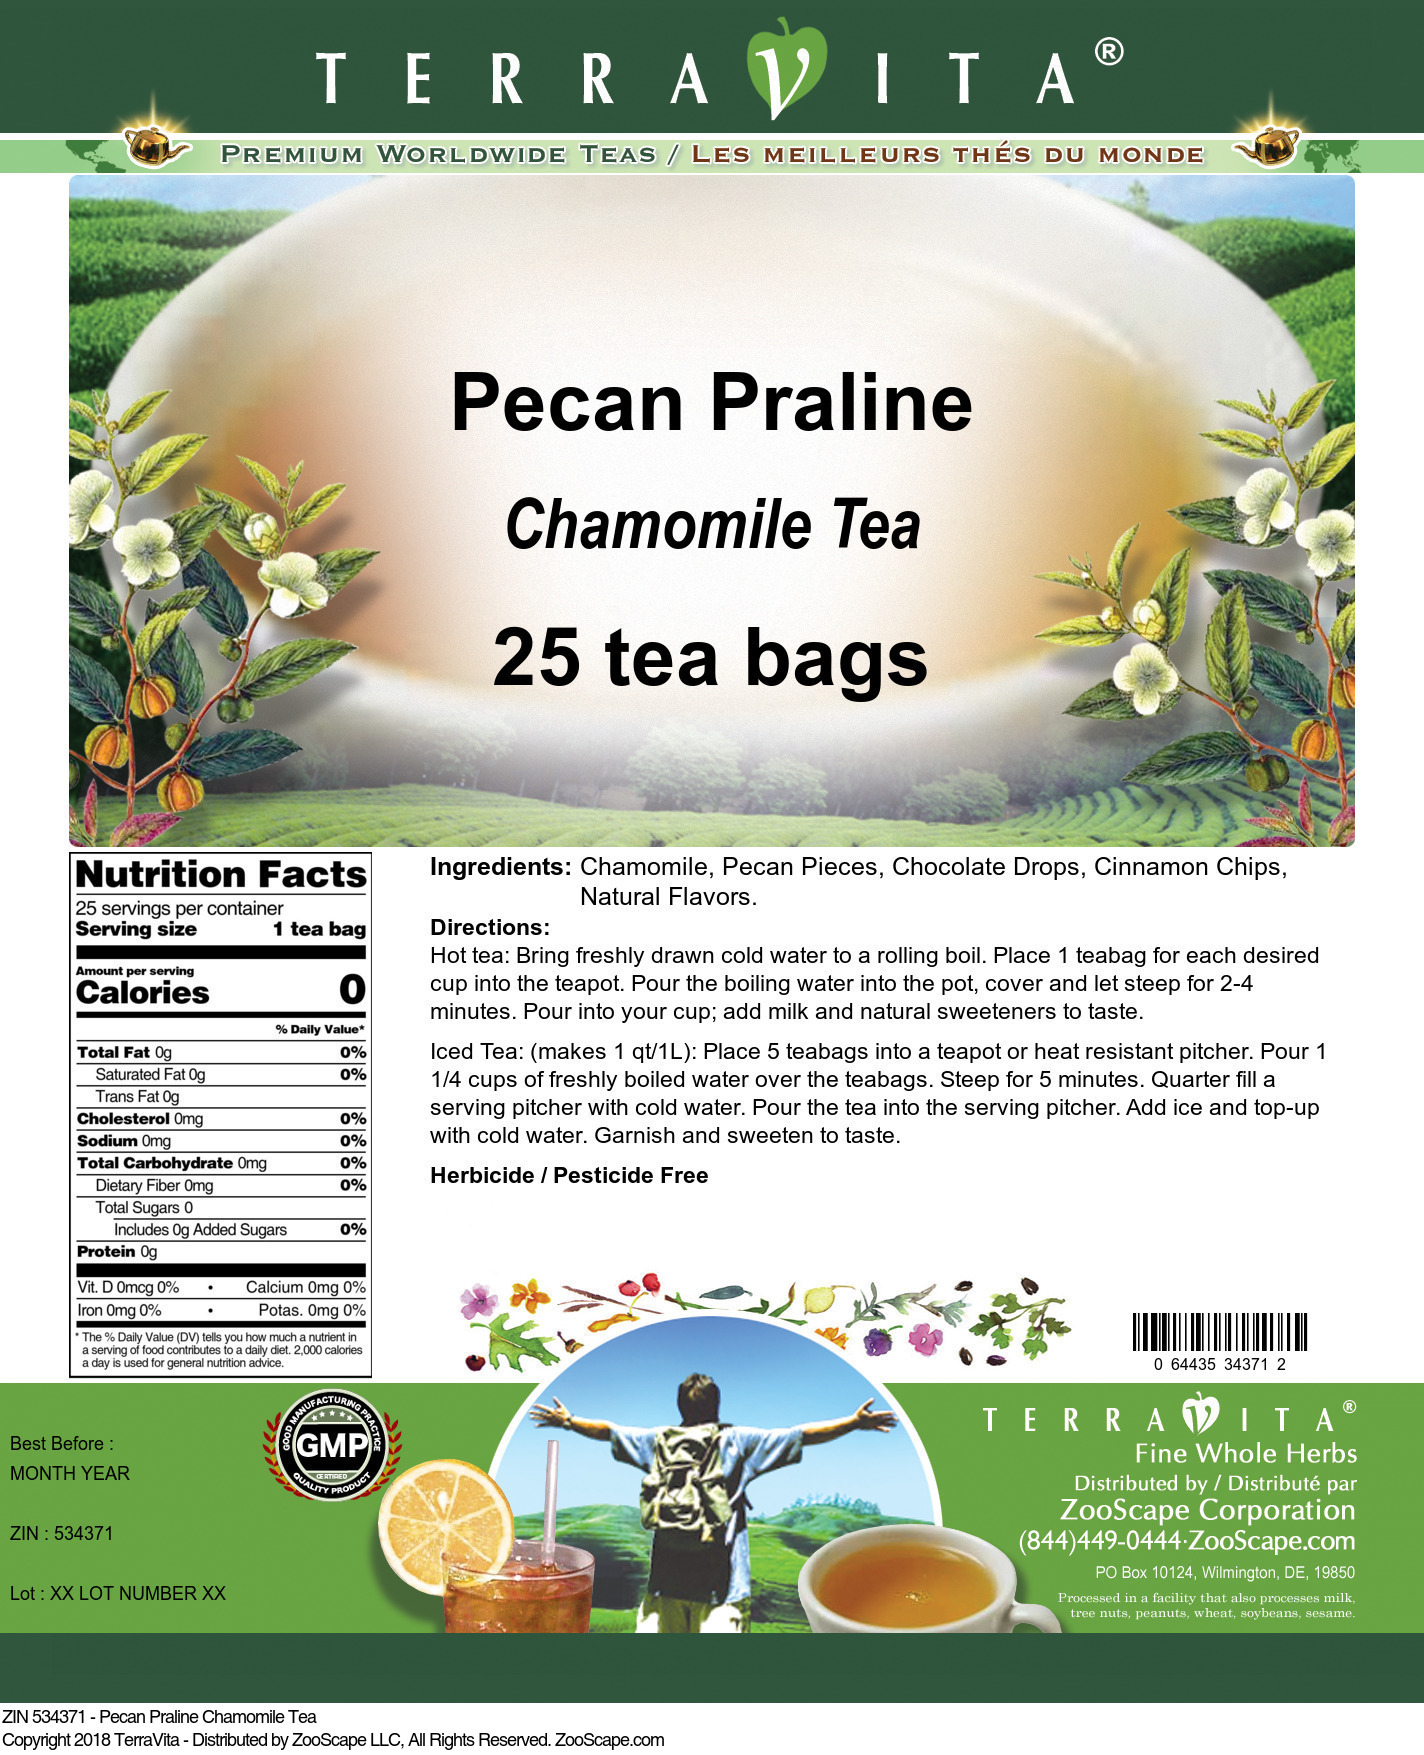 Pecan Praline Chamomile Tea